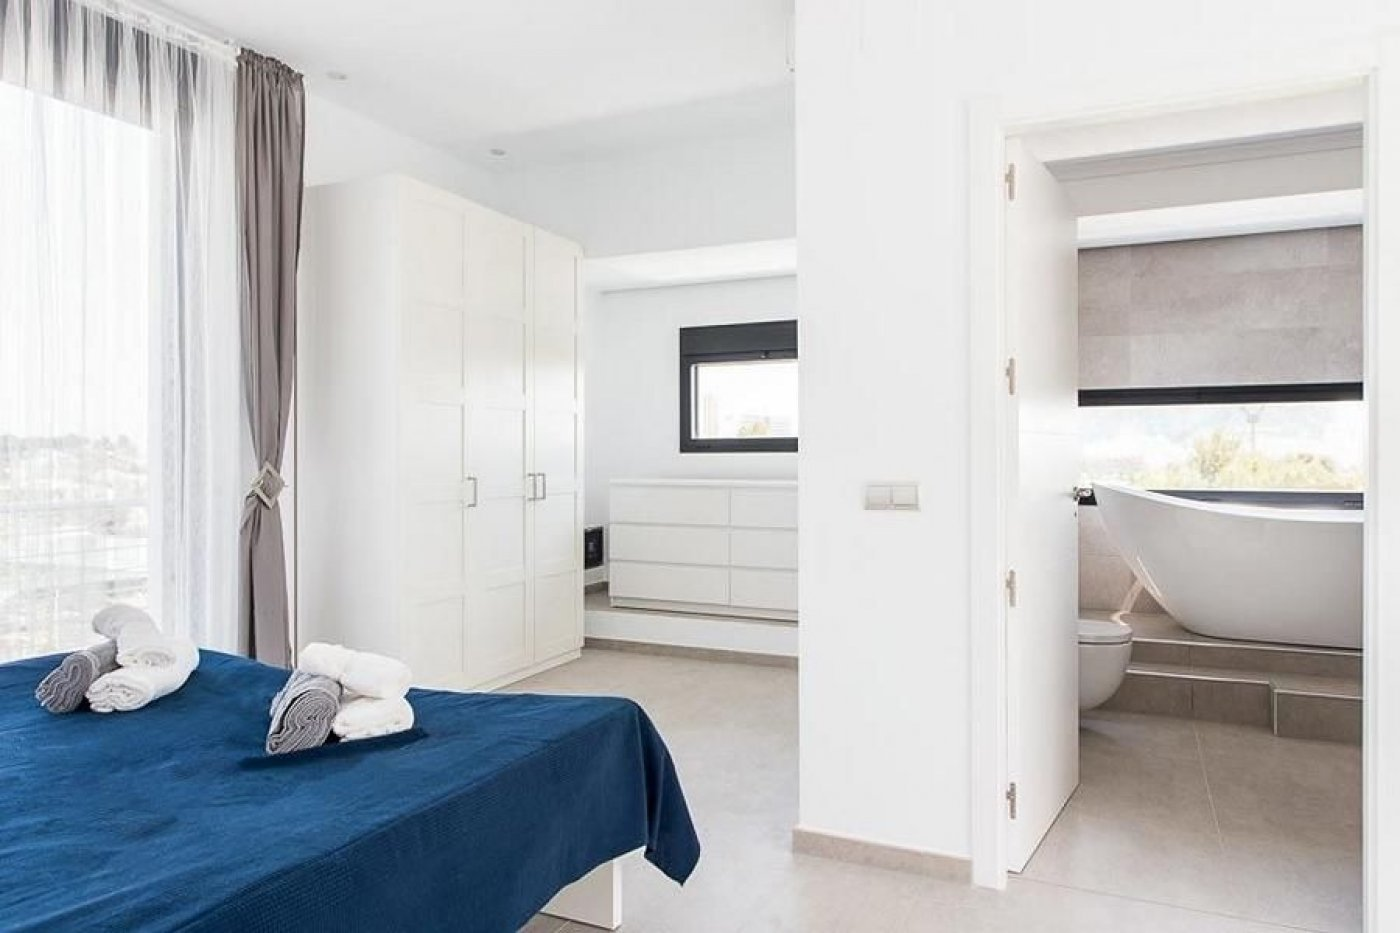 Nieuwe villa met hypermodern ontwerp in Calpe